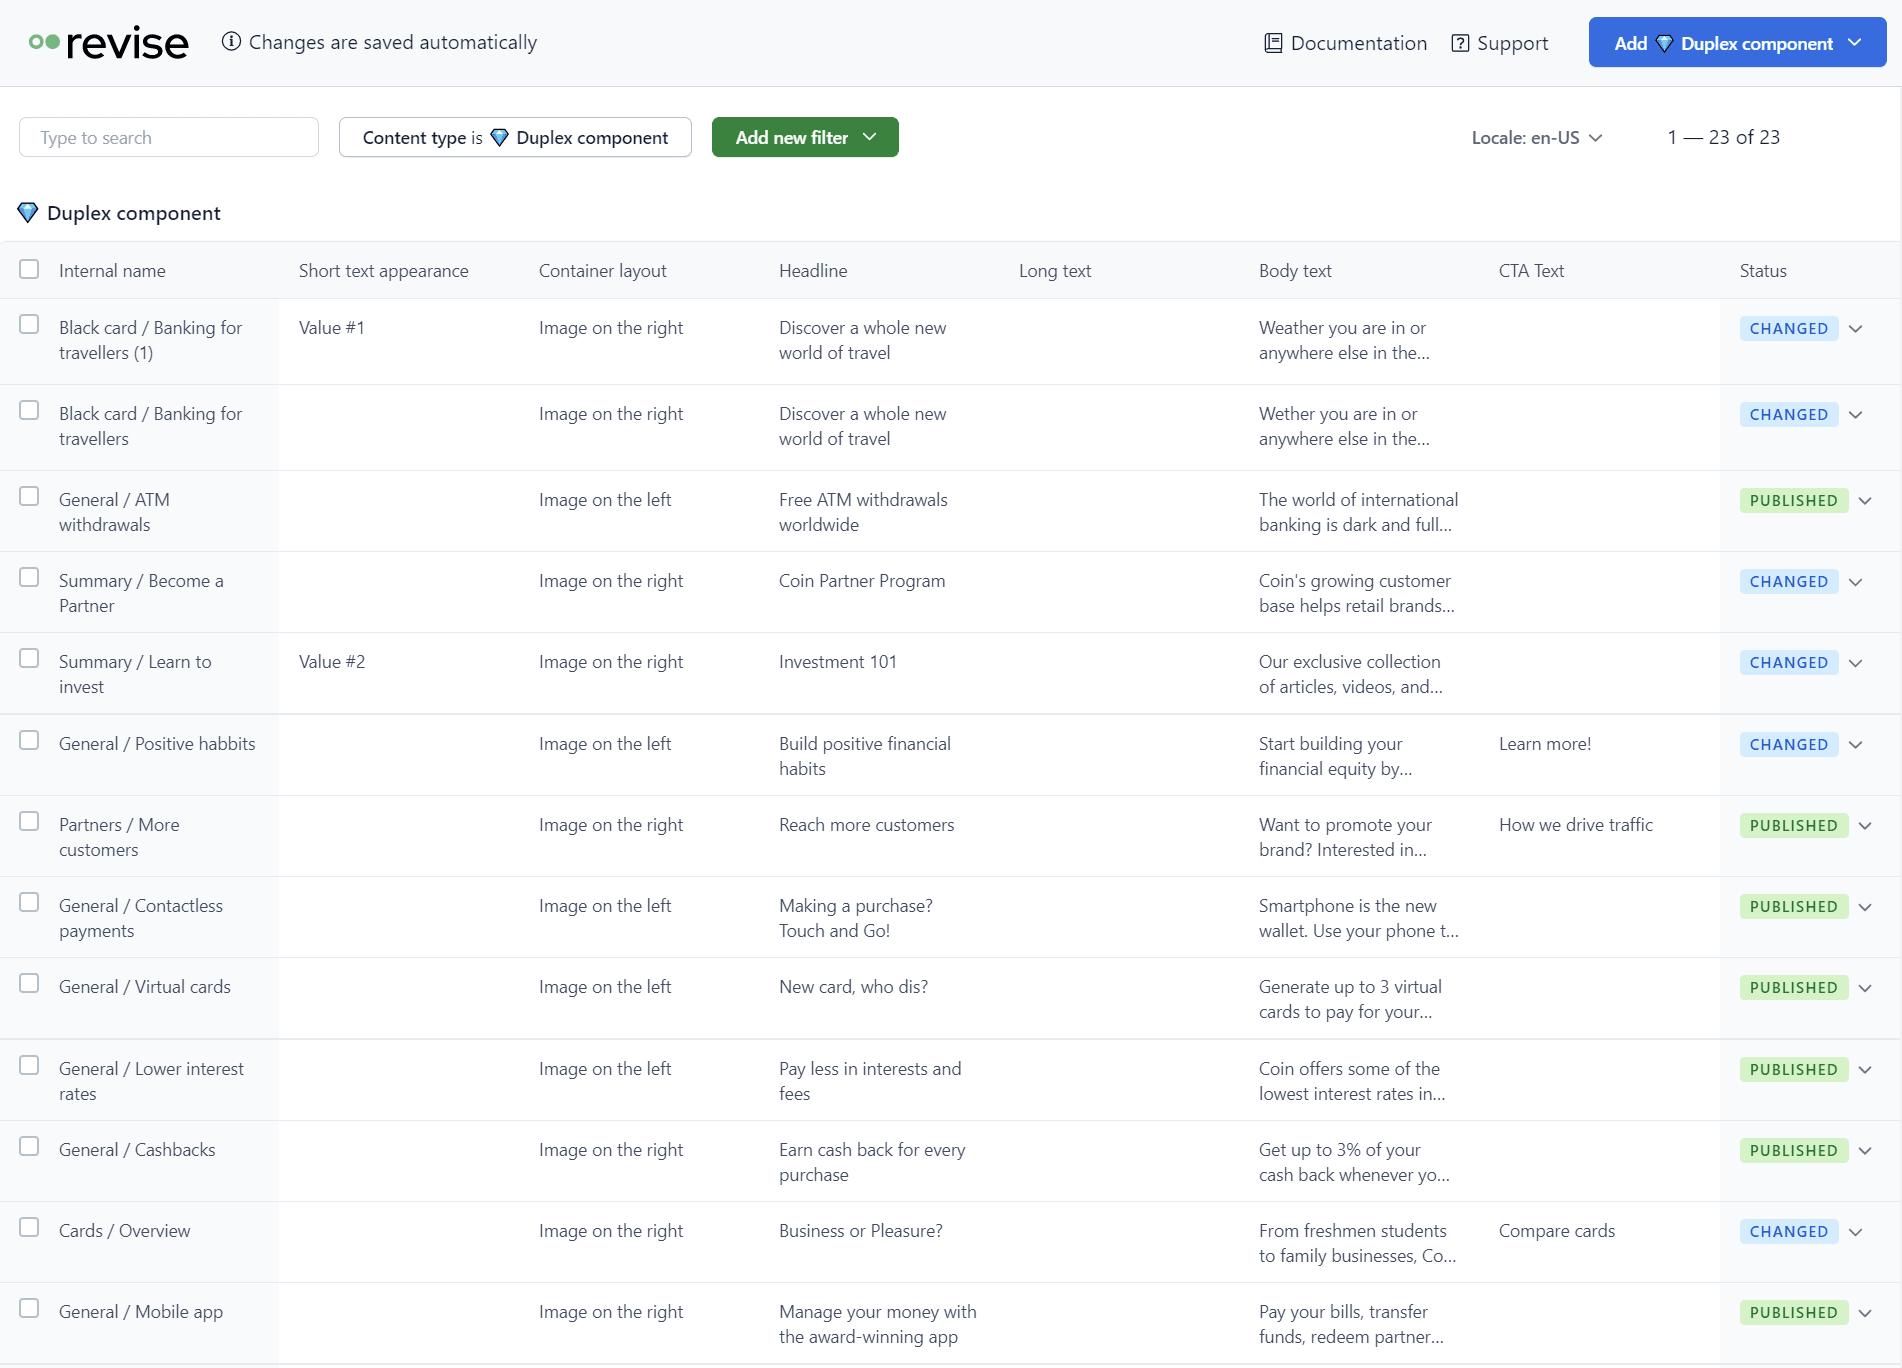 Revise spreadsheet interface